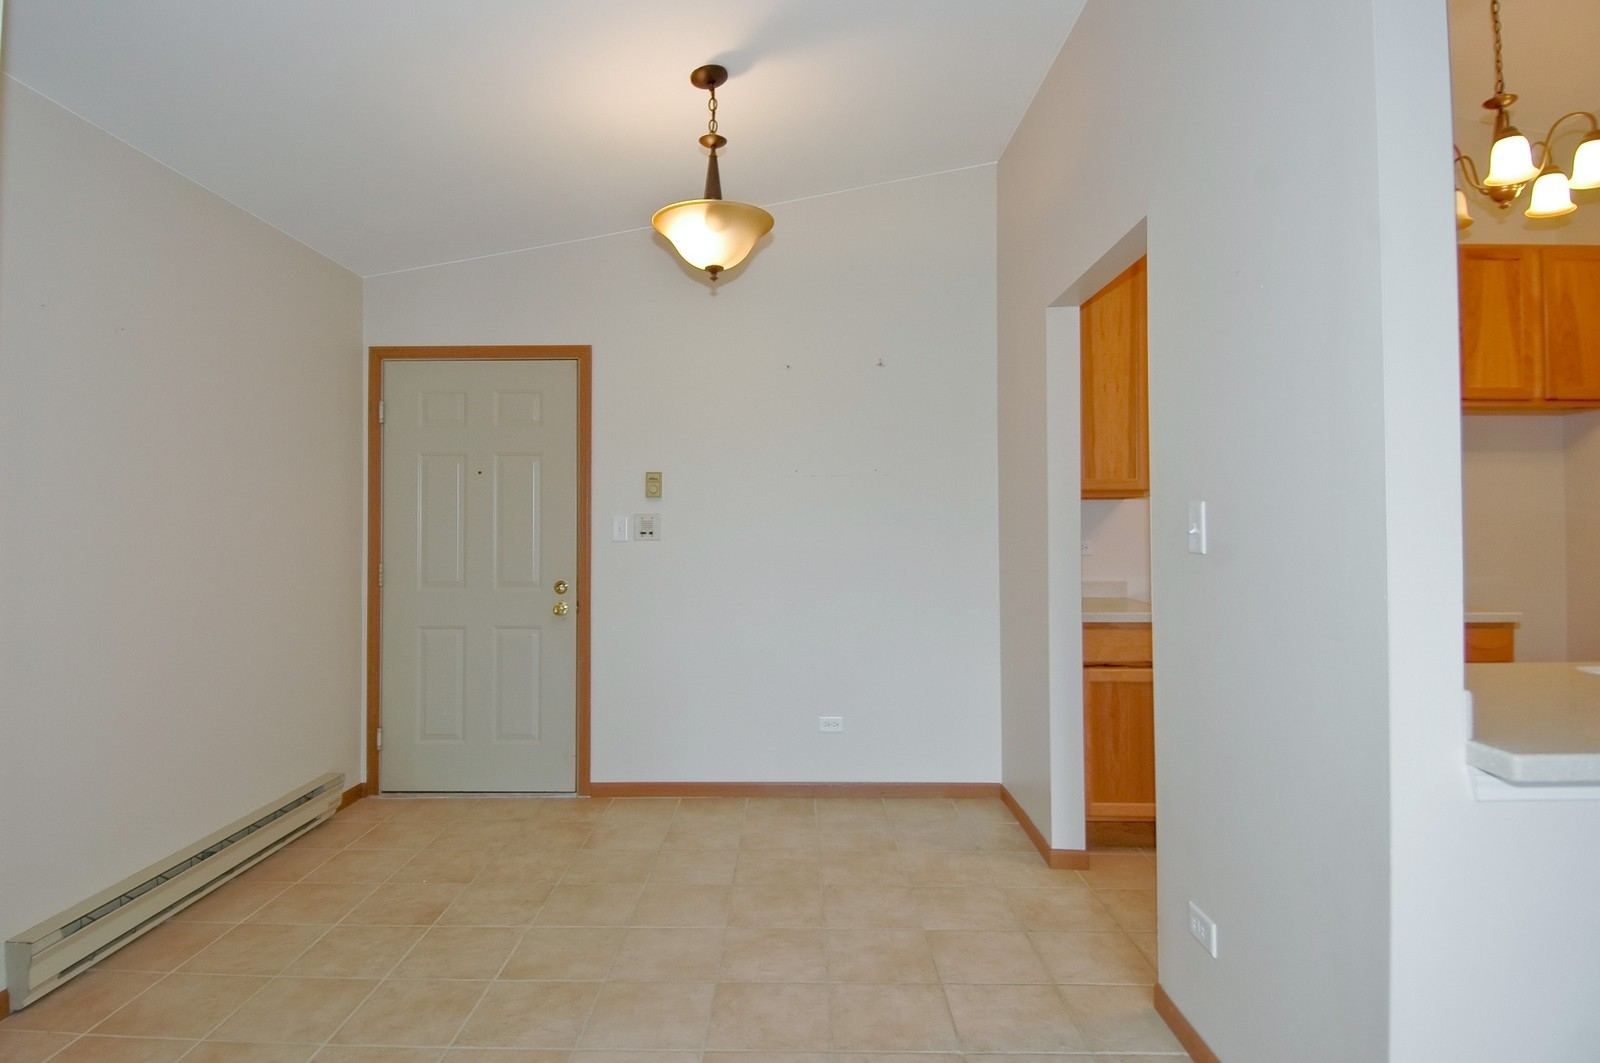 Real Estate Photography - 4314 Shamrock Ln, Unit 3B, McHenry, IL, 60050 - Kitchen / Dining Room